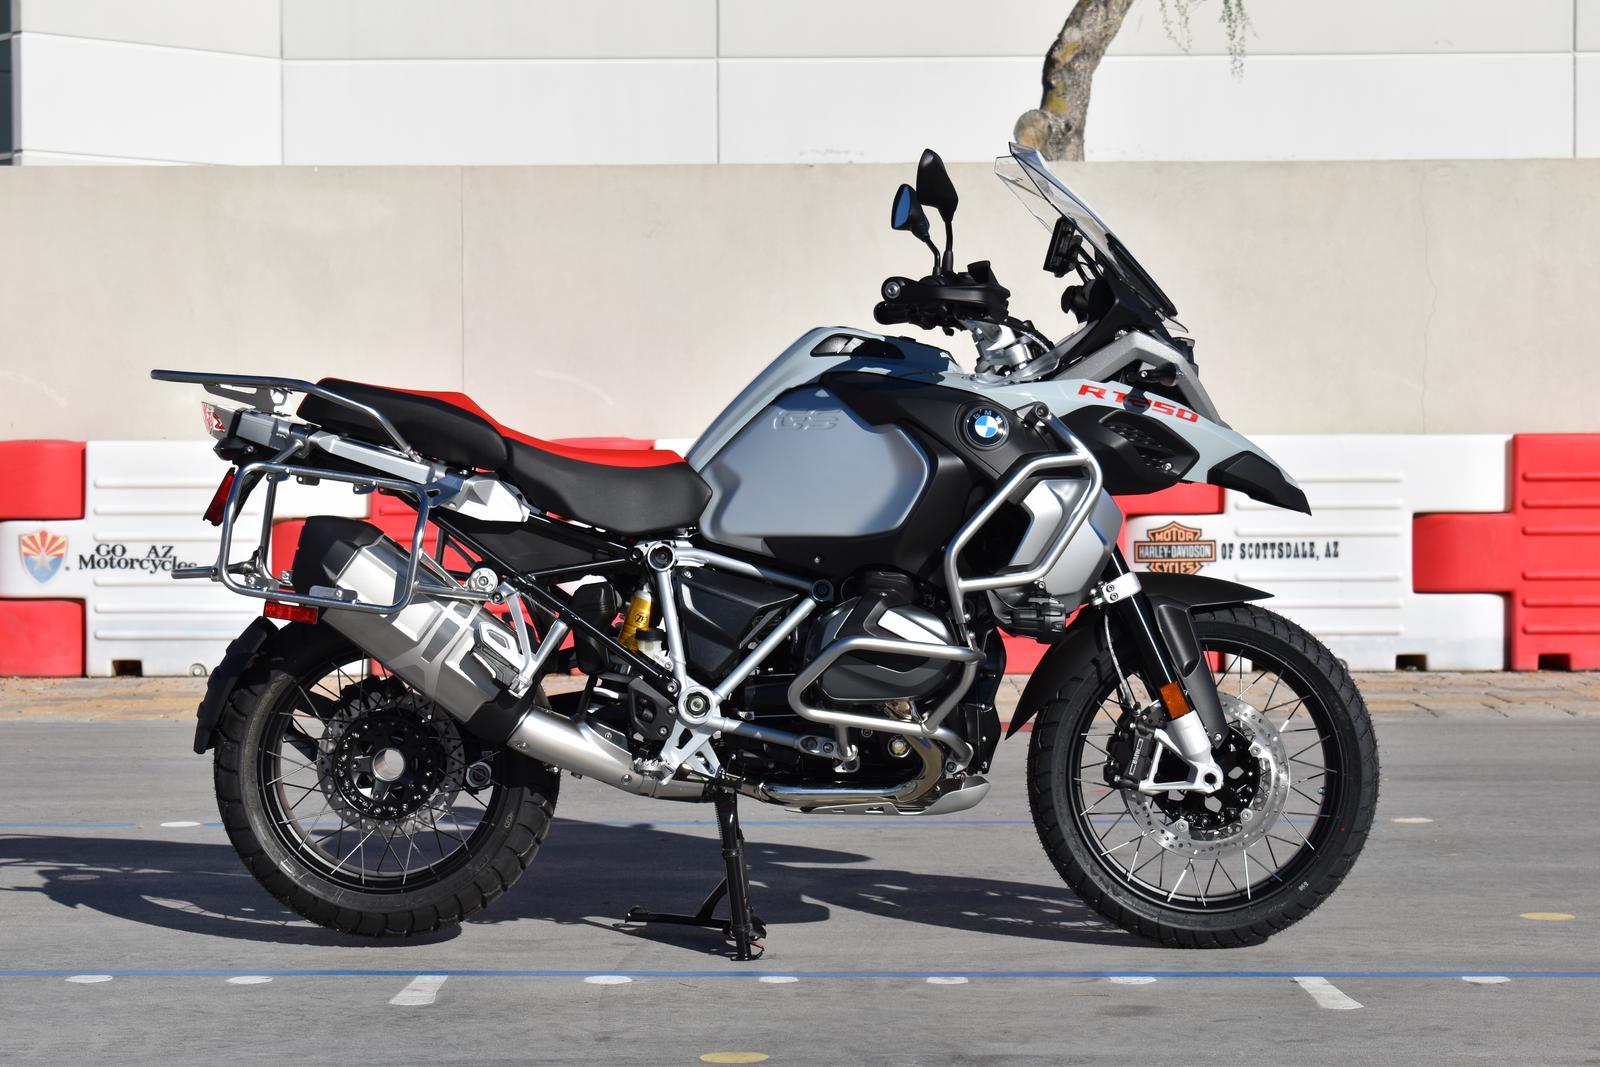 2020 Bmw R1250gsa For Sale In Scottsdale Az Go Az Motorcycles